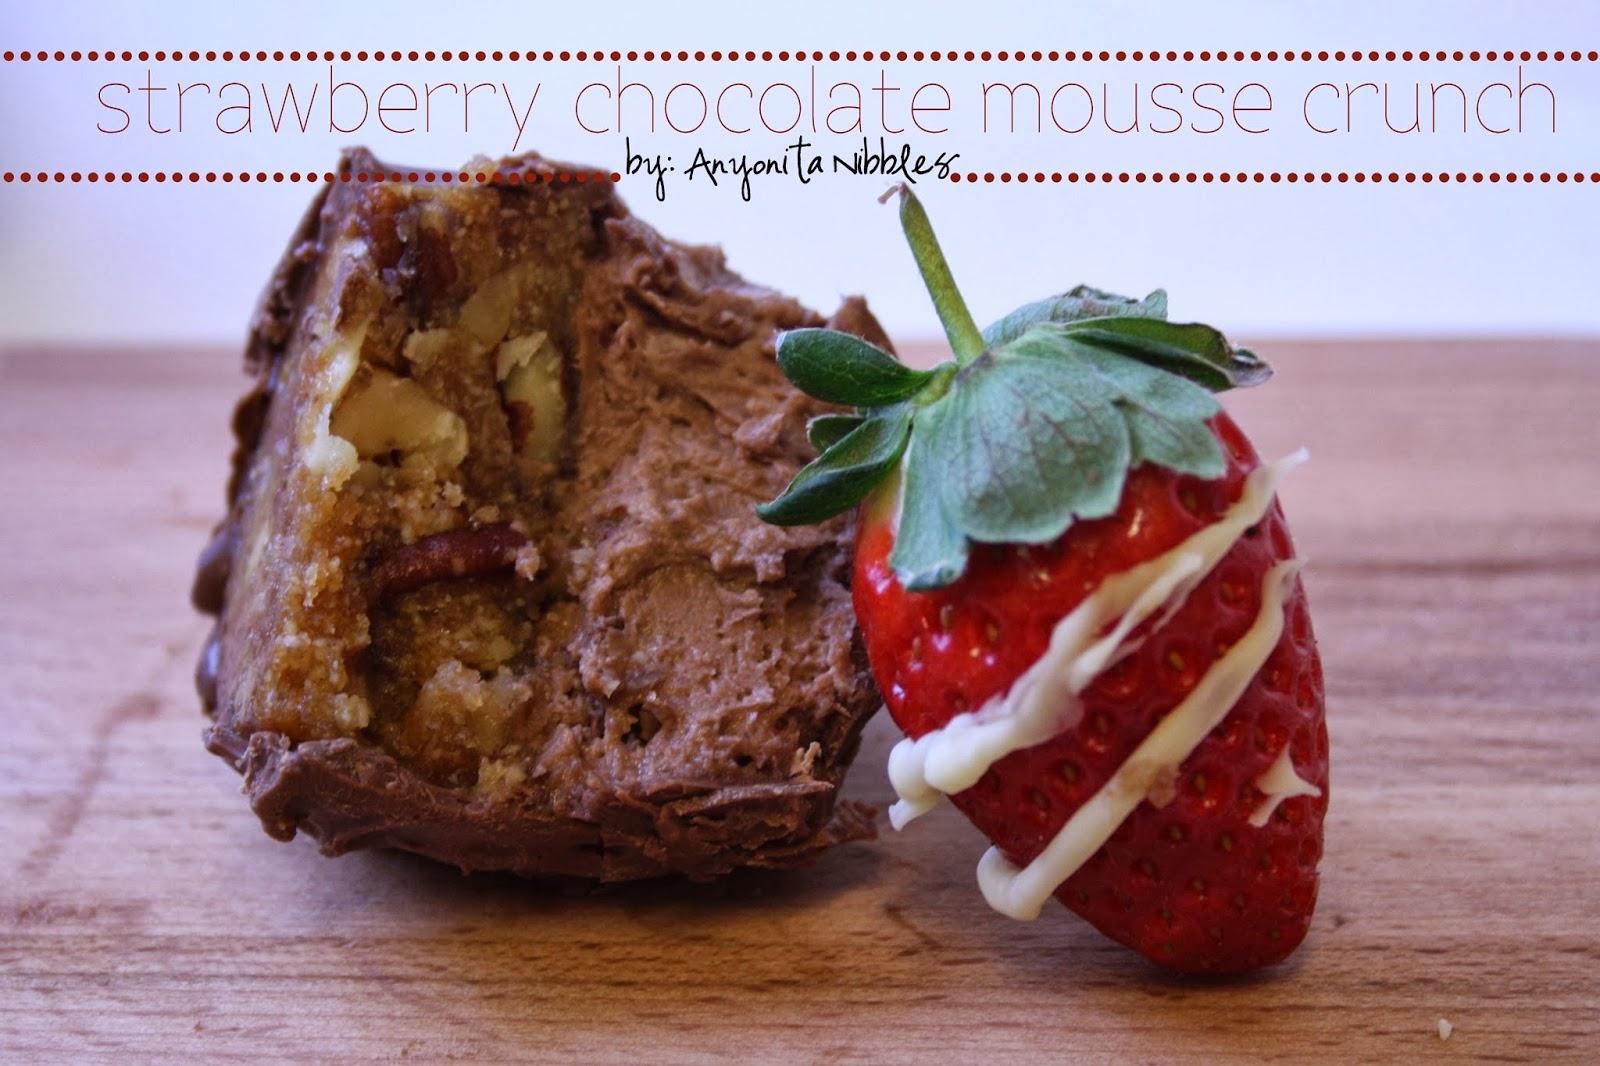 Strawberry Chocolate Mousse Crunch Gluten Free Dessert for Valentine's Day